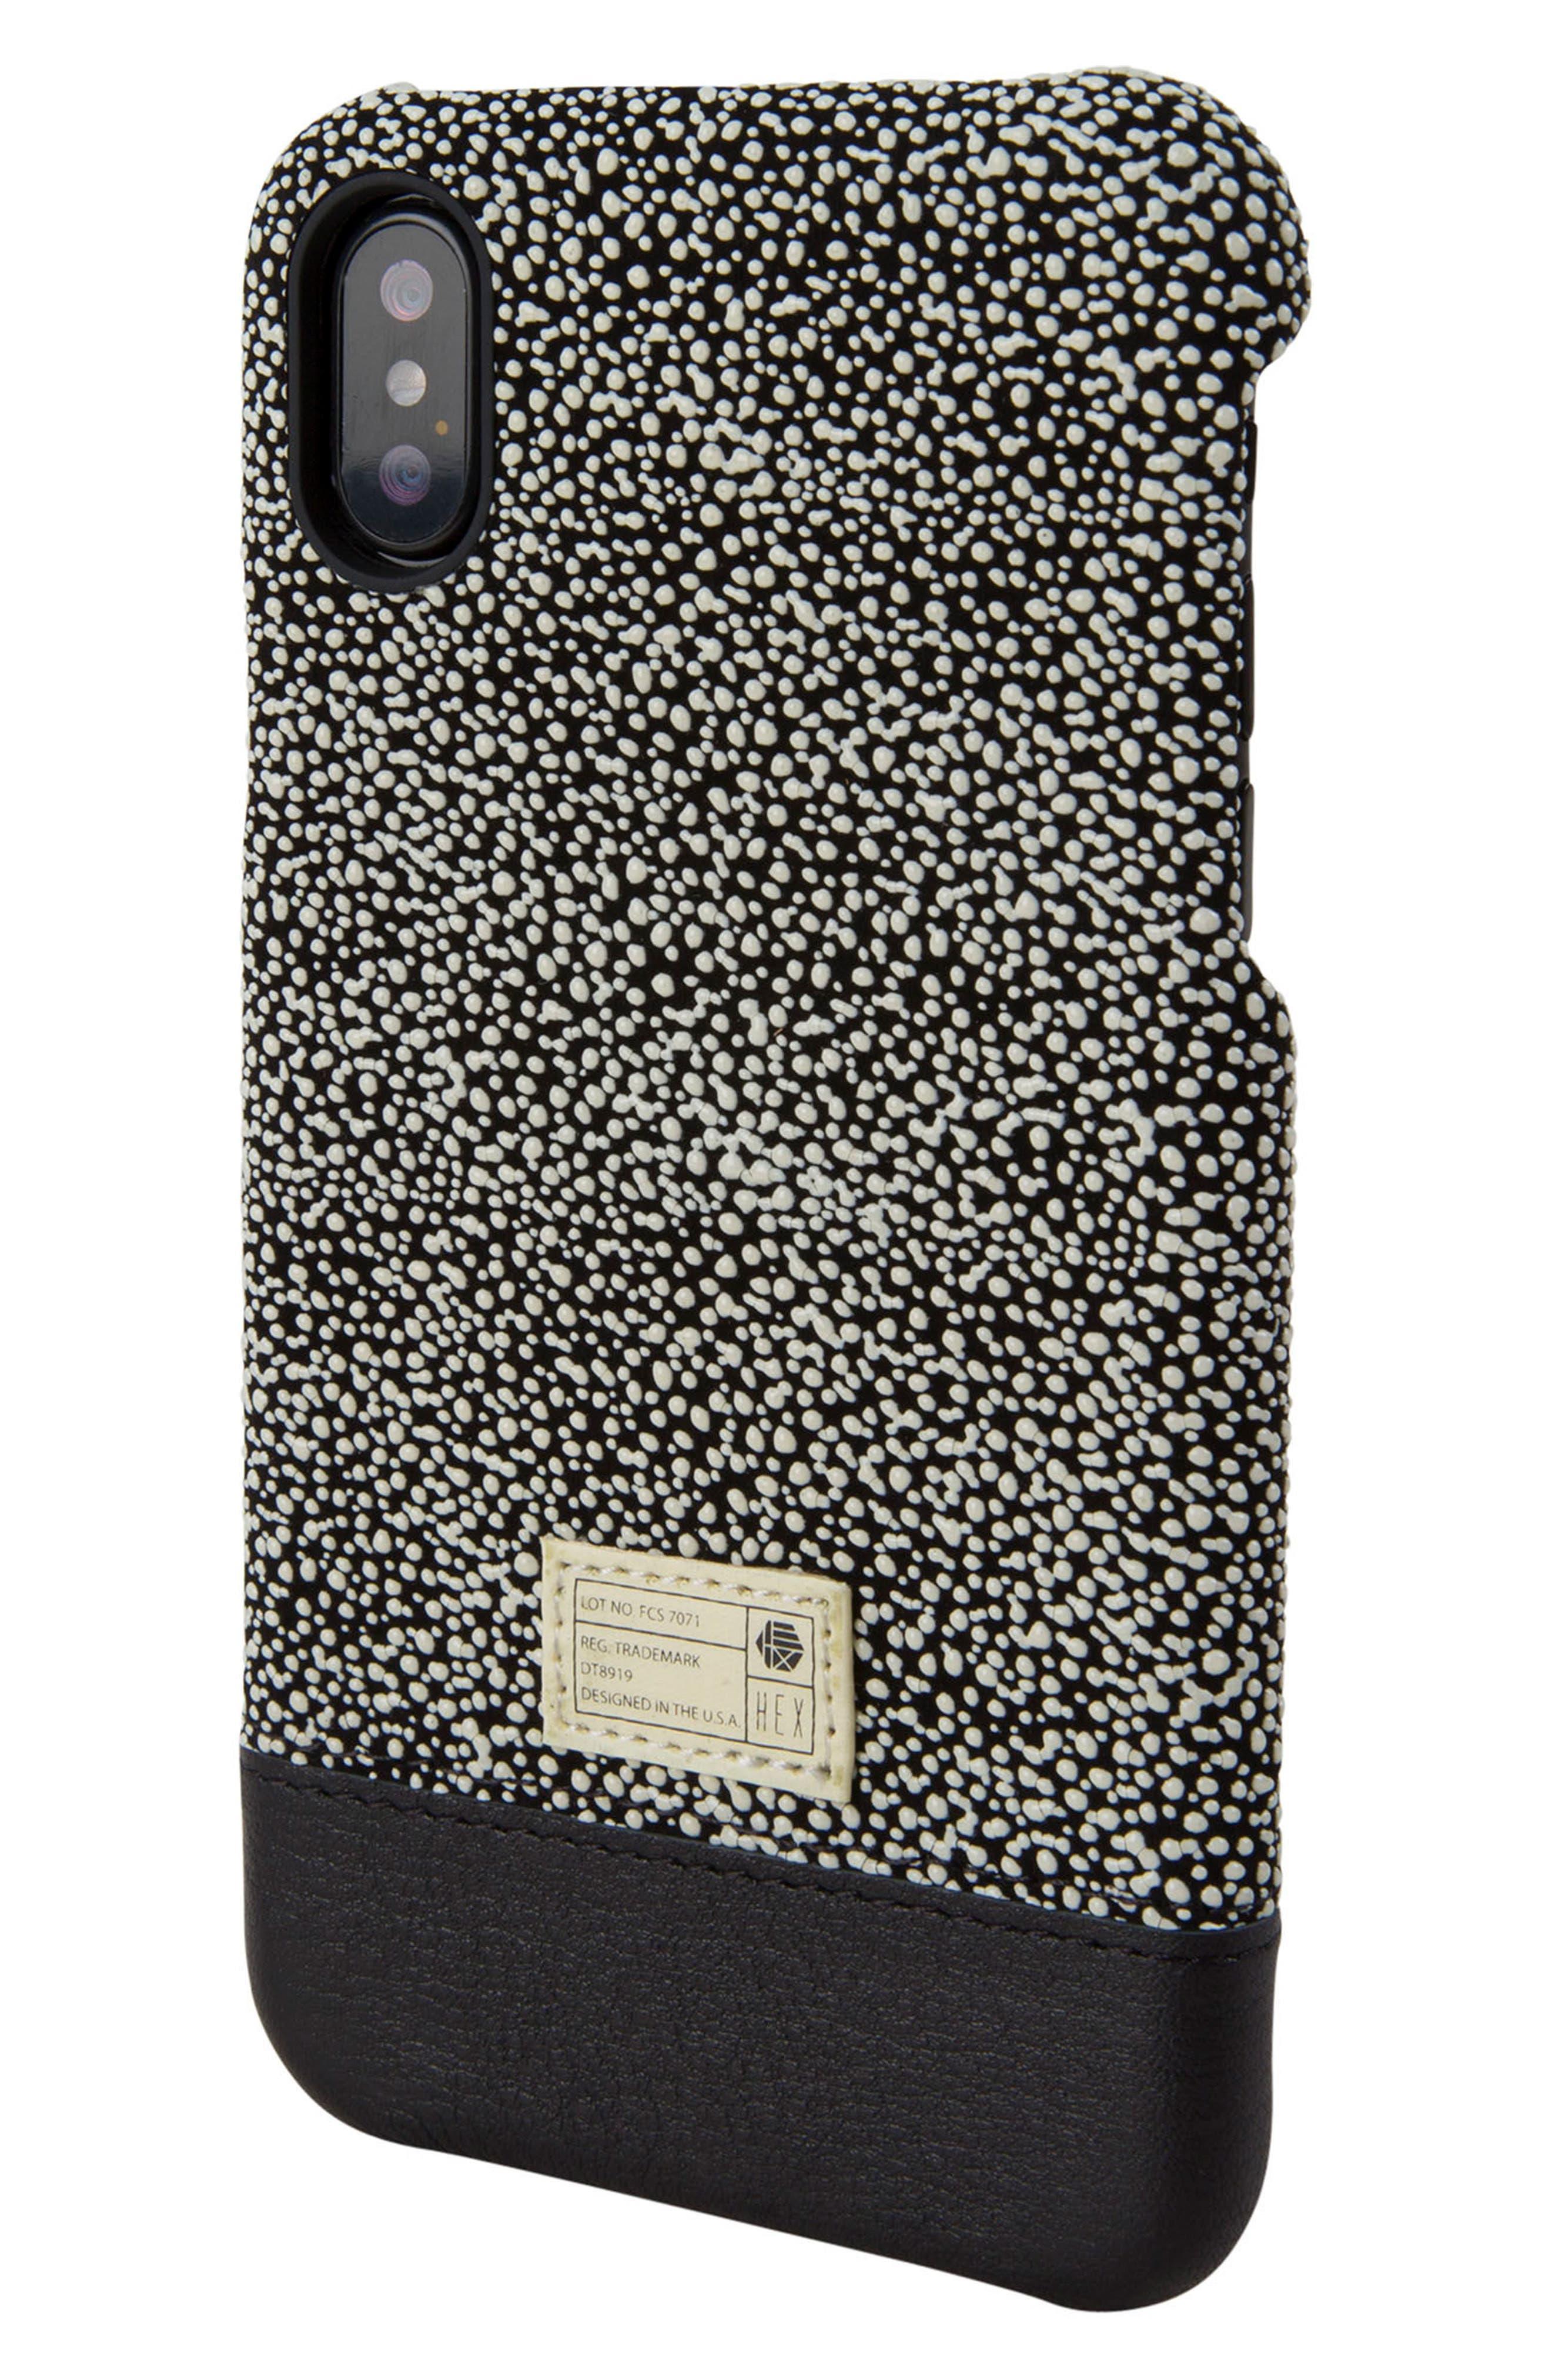 Focus Leather iPhone X Case,                             Main thumbnail 1, color,                             Black/ White Stingray